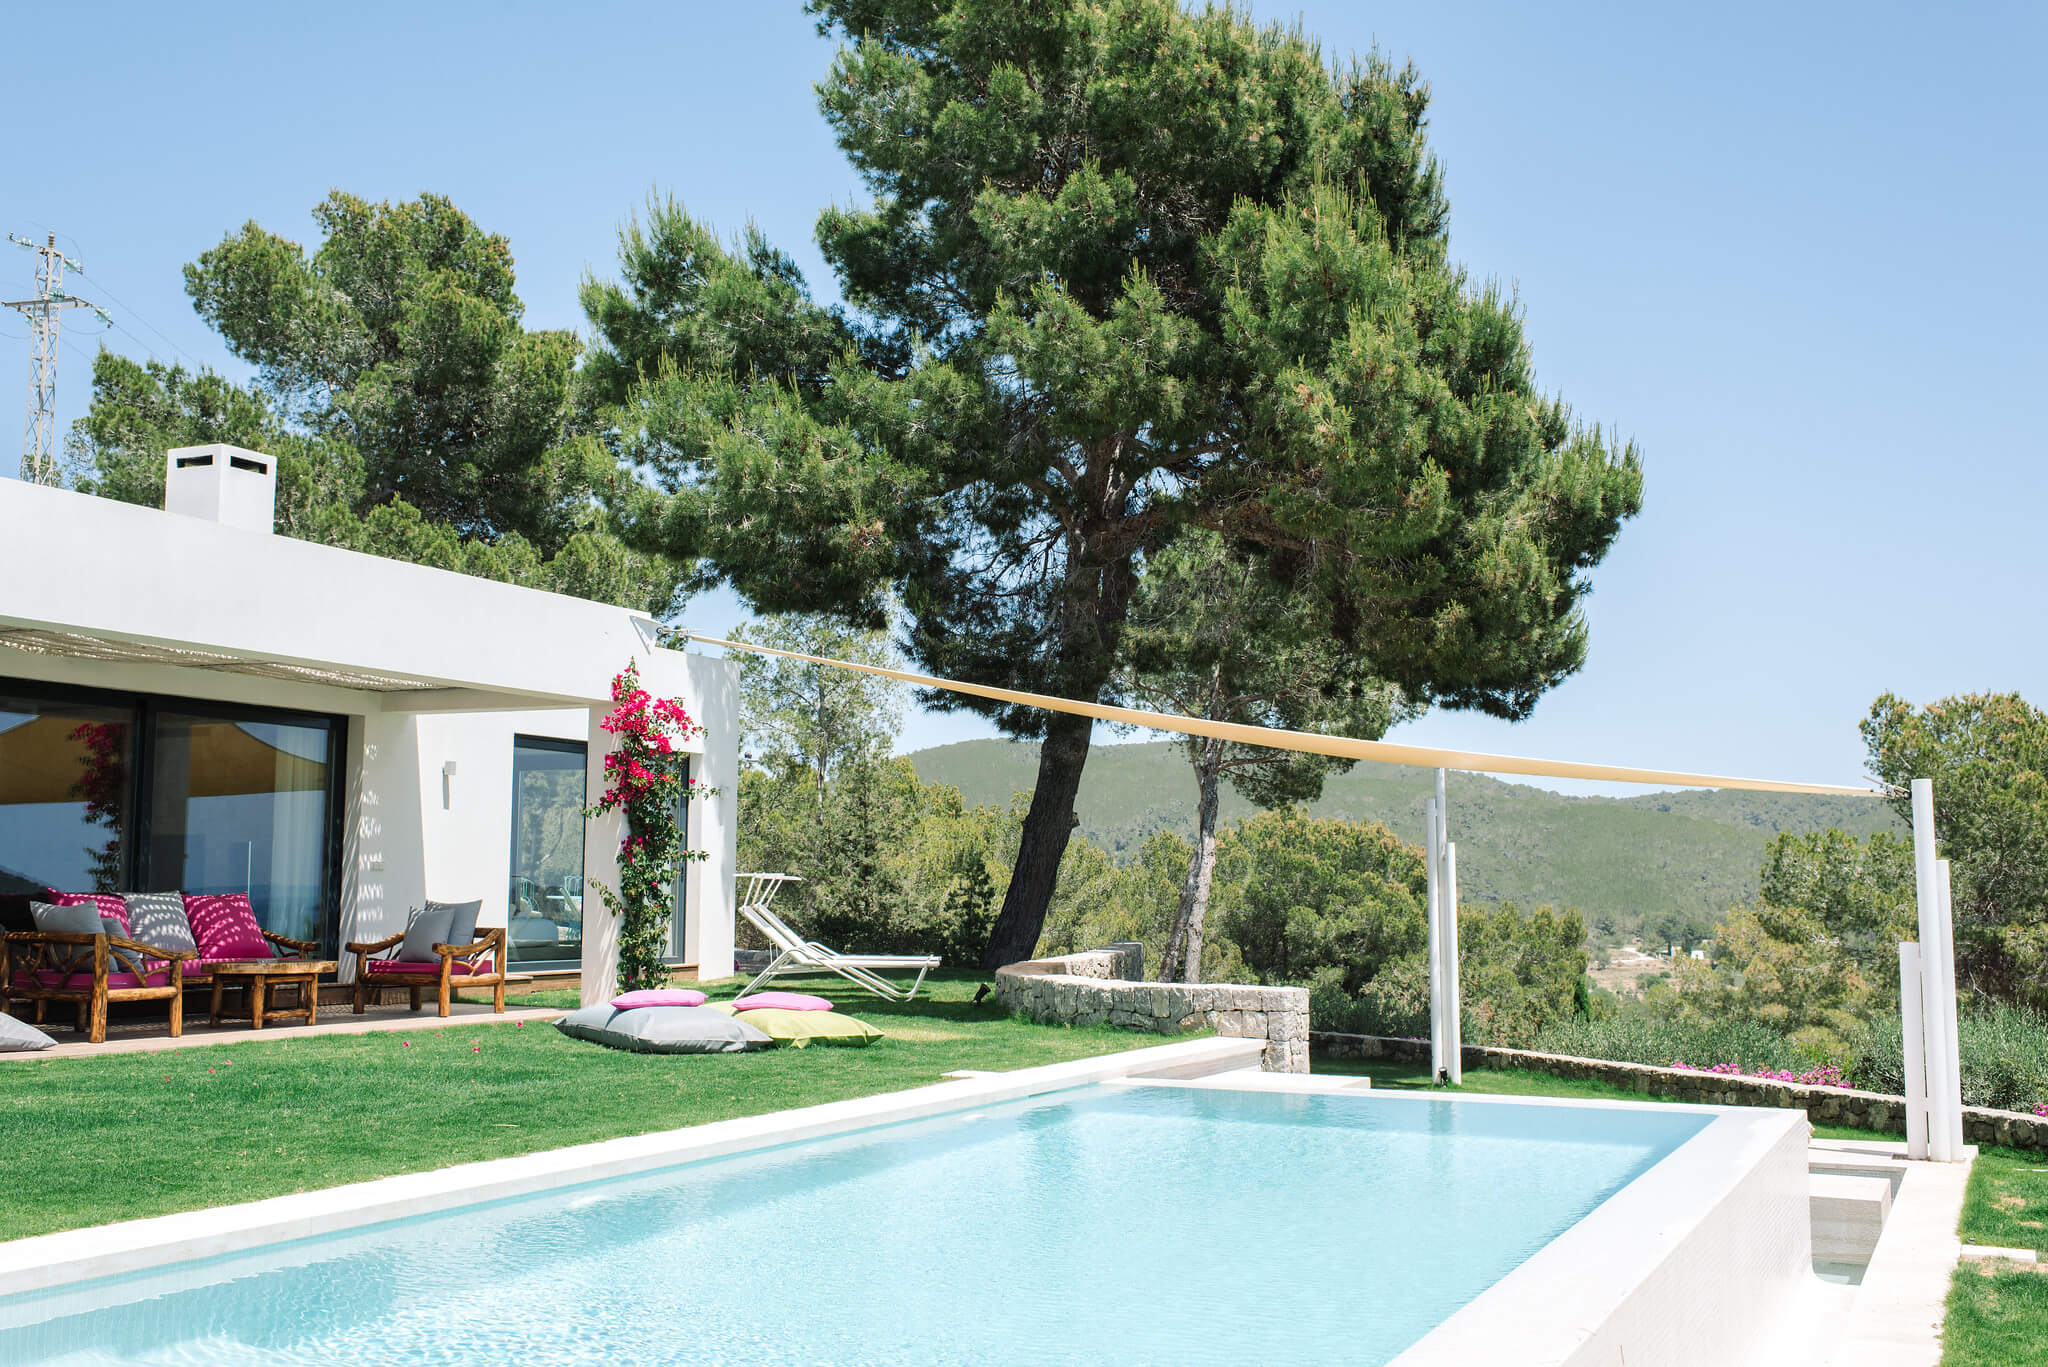 https://www.white-ibiza.com/wp-content/uploads/2020/06/white-ibiza-villas-can-jondal-exterior-across-pool-to-chillout.jpg